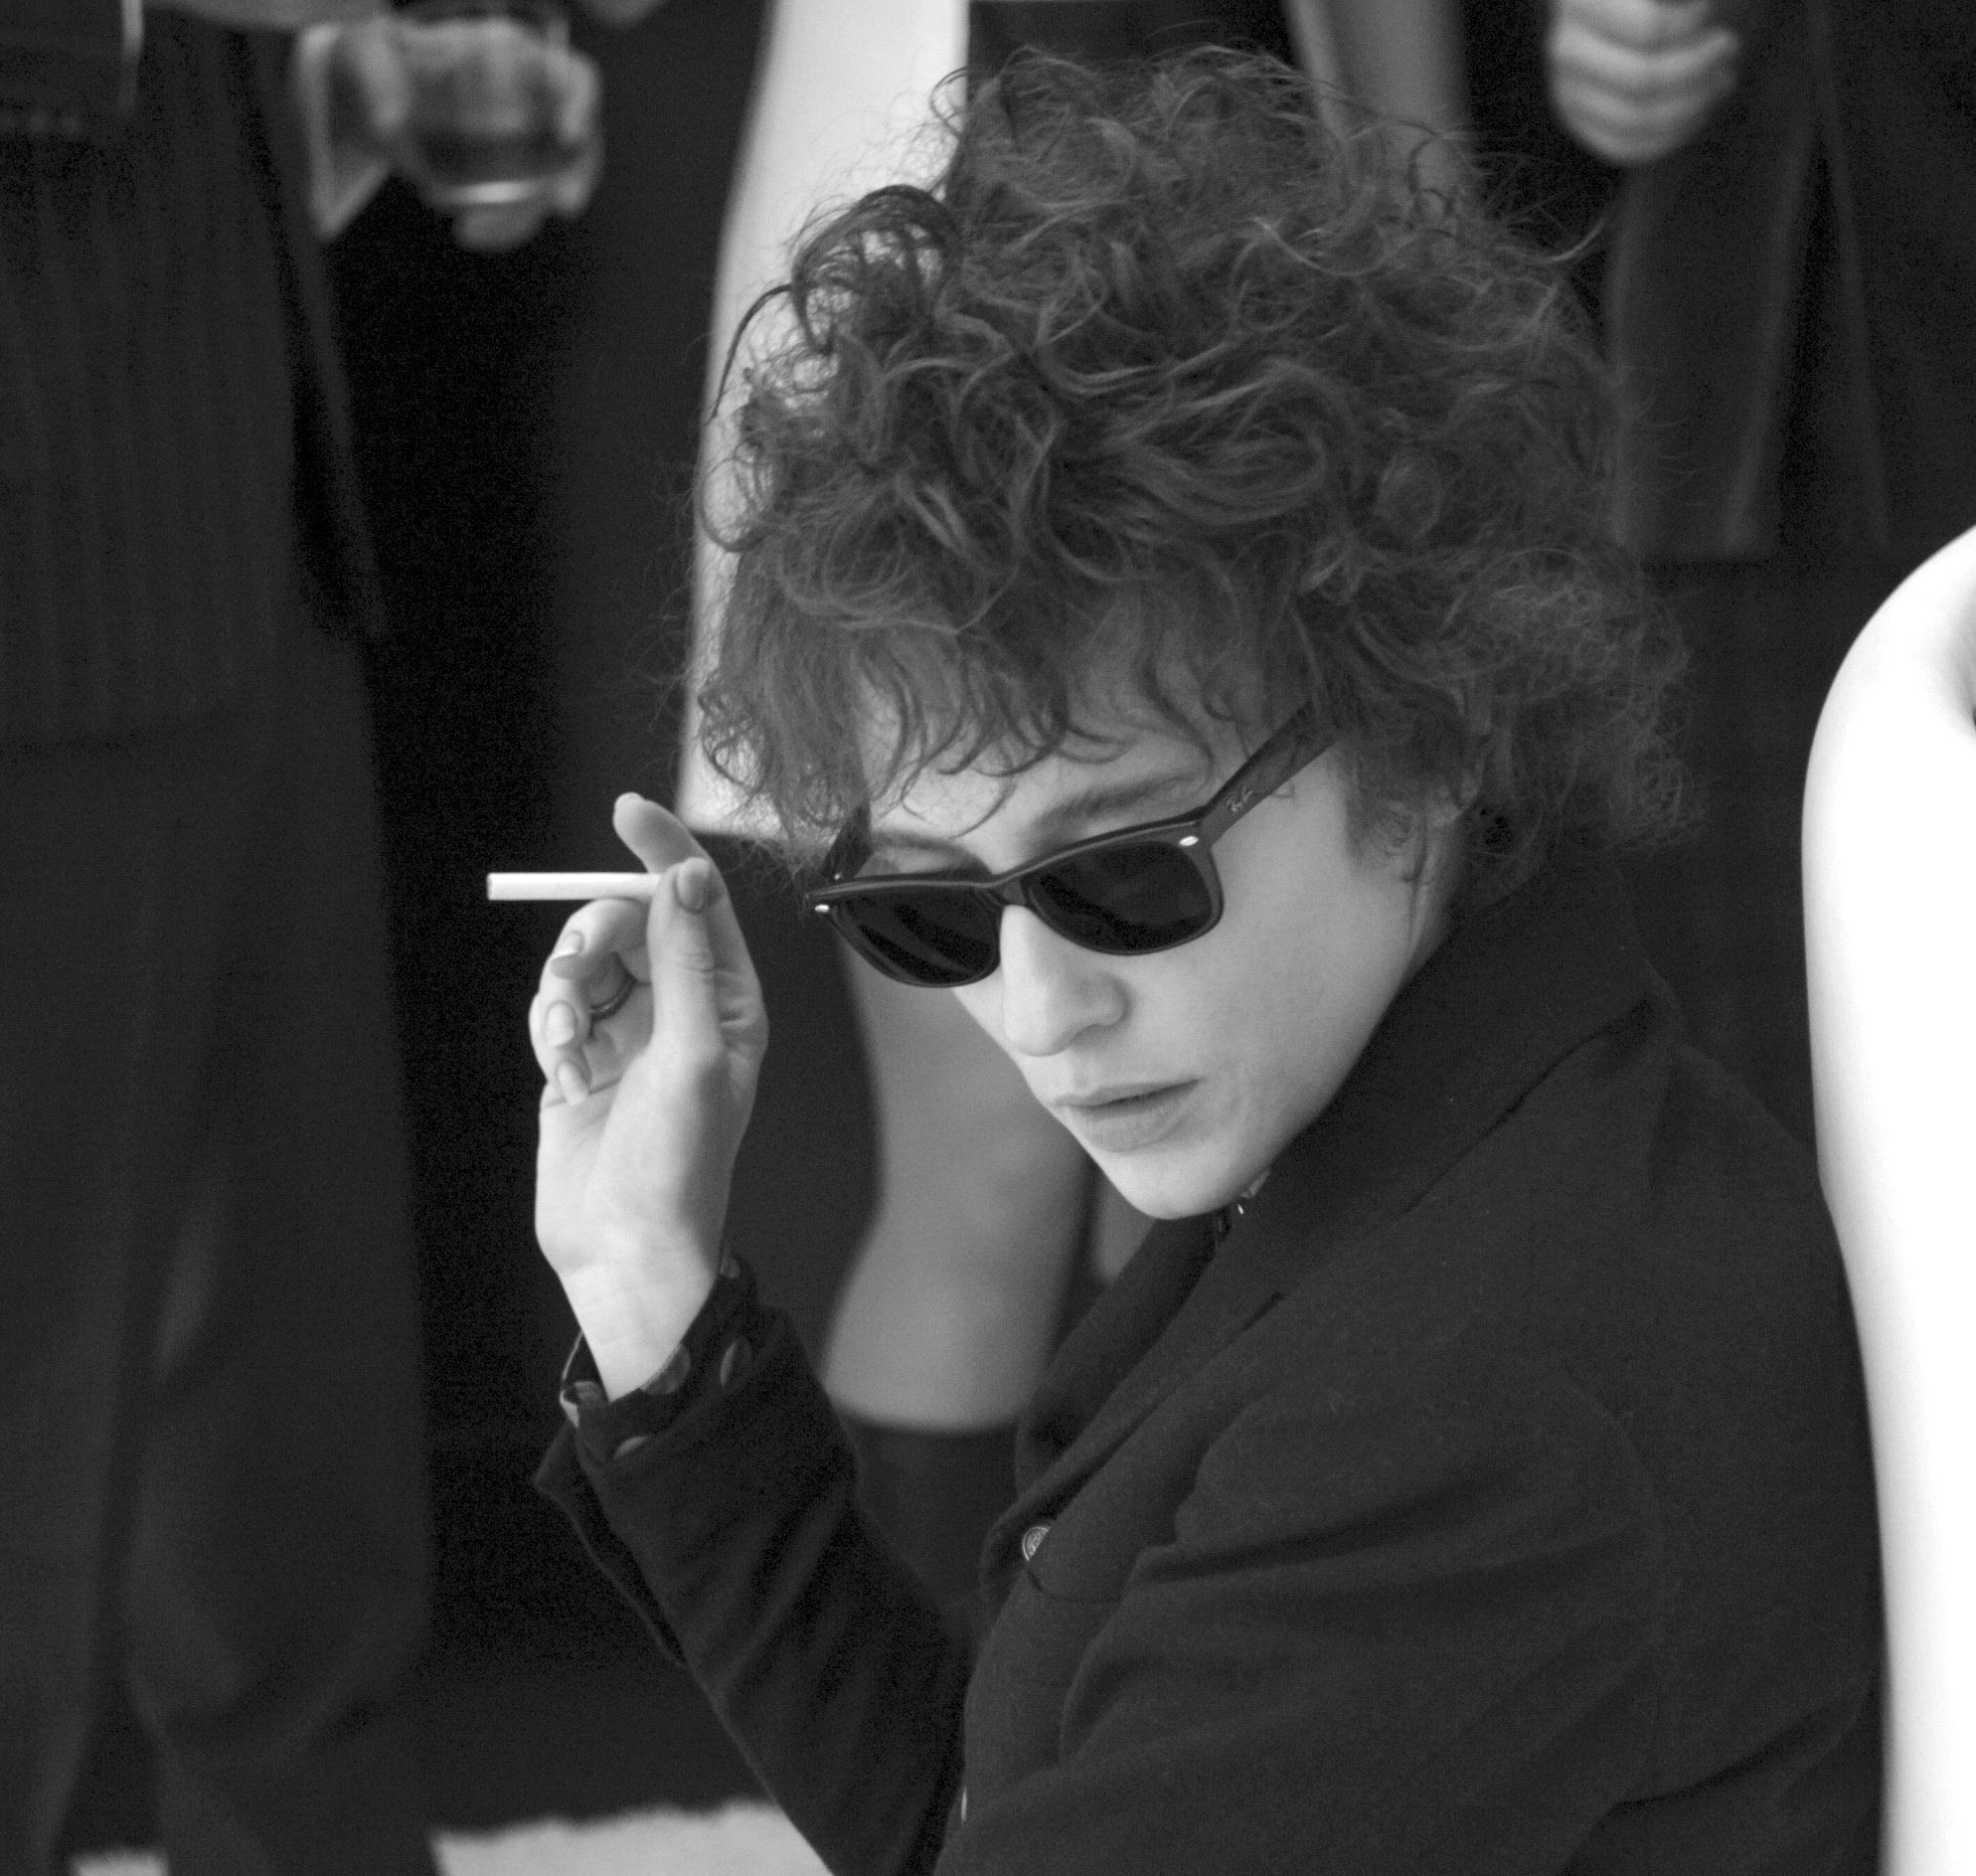 How Does It Feel Cate Blanchett As Bob Dylan Cate Blanchett Bob Dylan Bob Dylan Cate Blanchett